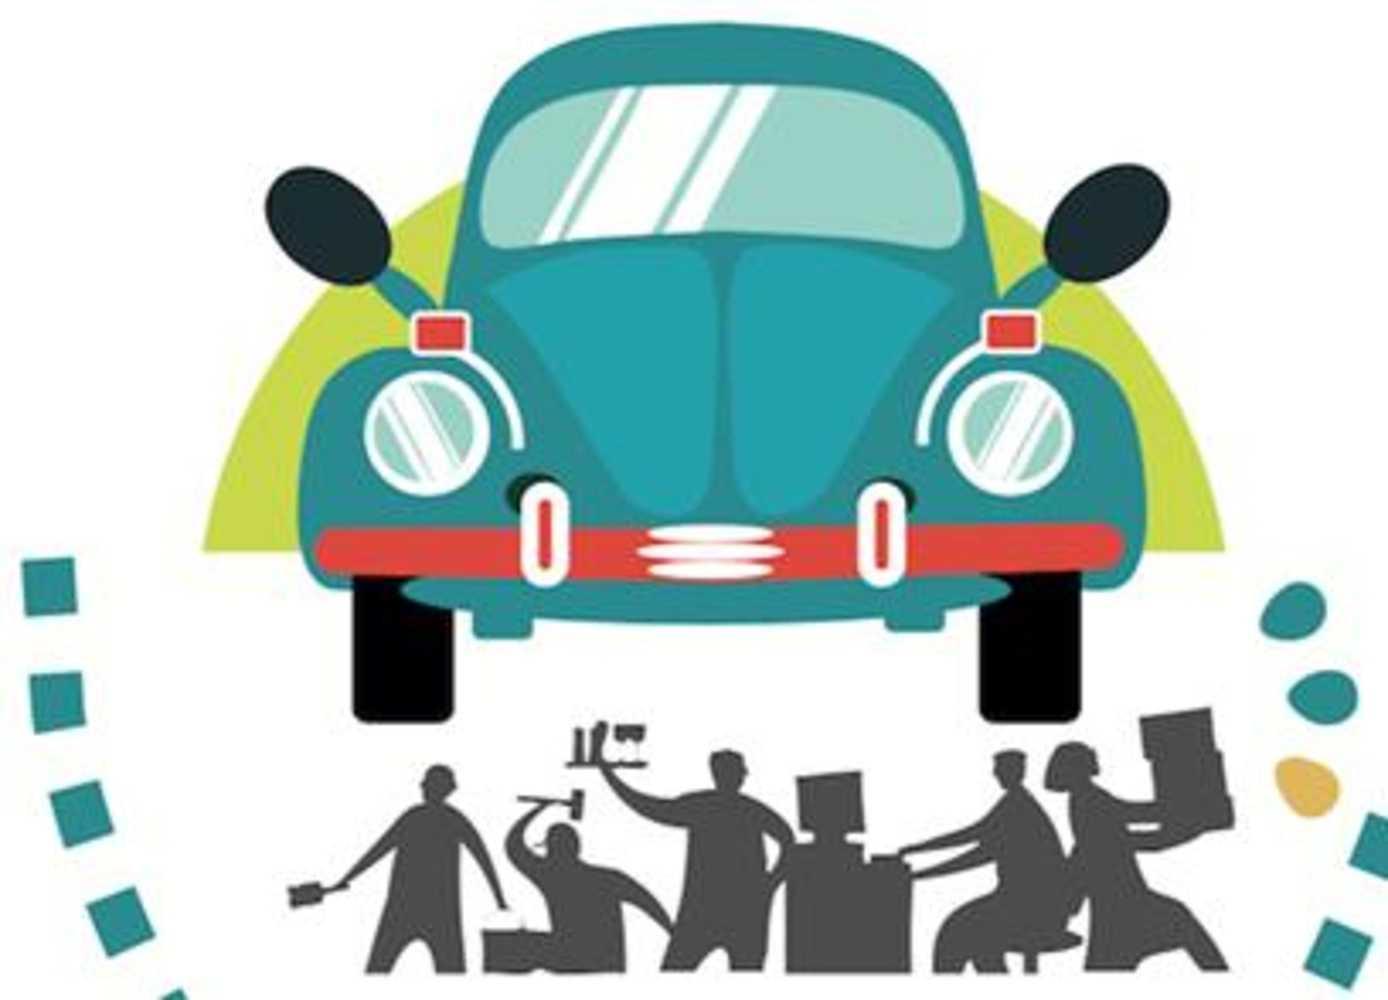 Rallye des entreprises - Vendredi 30 novembre 0